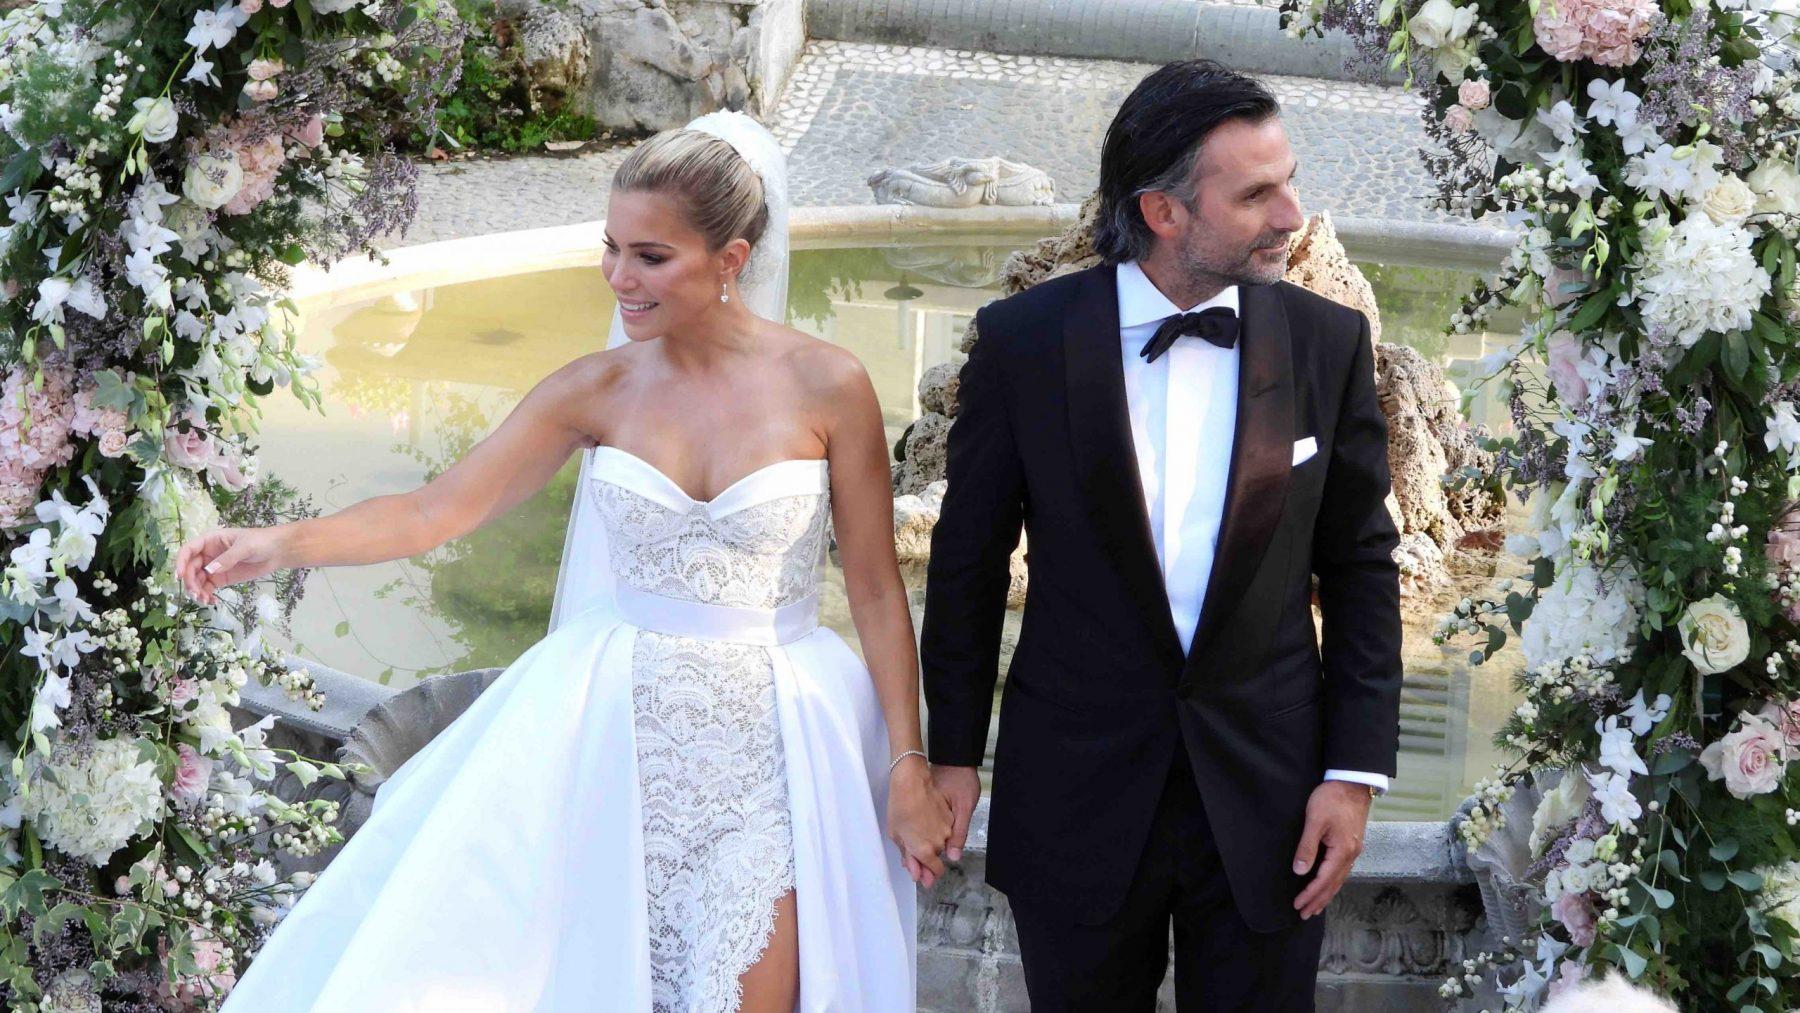 getrouwd sylvie meis niclas castello